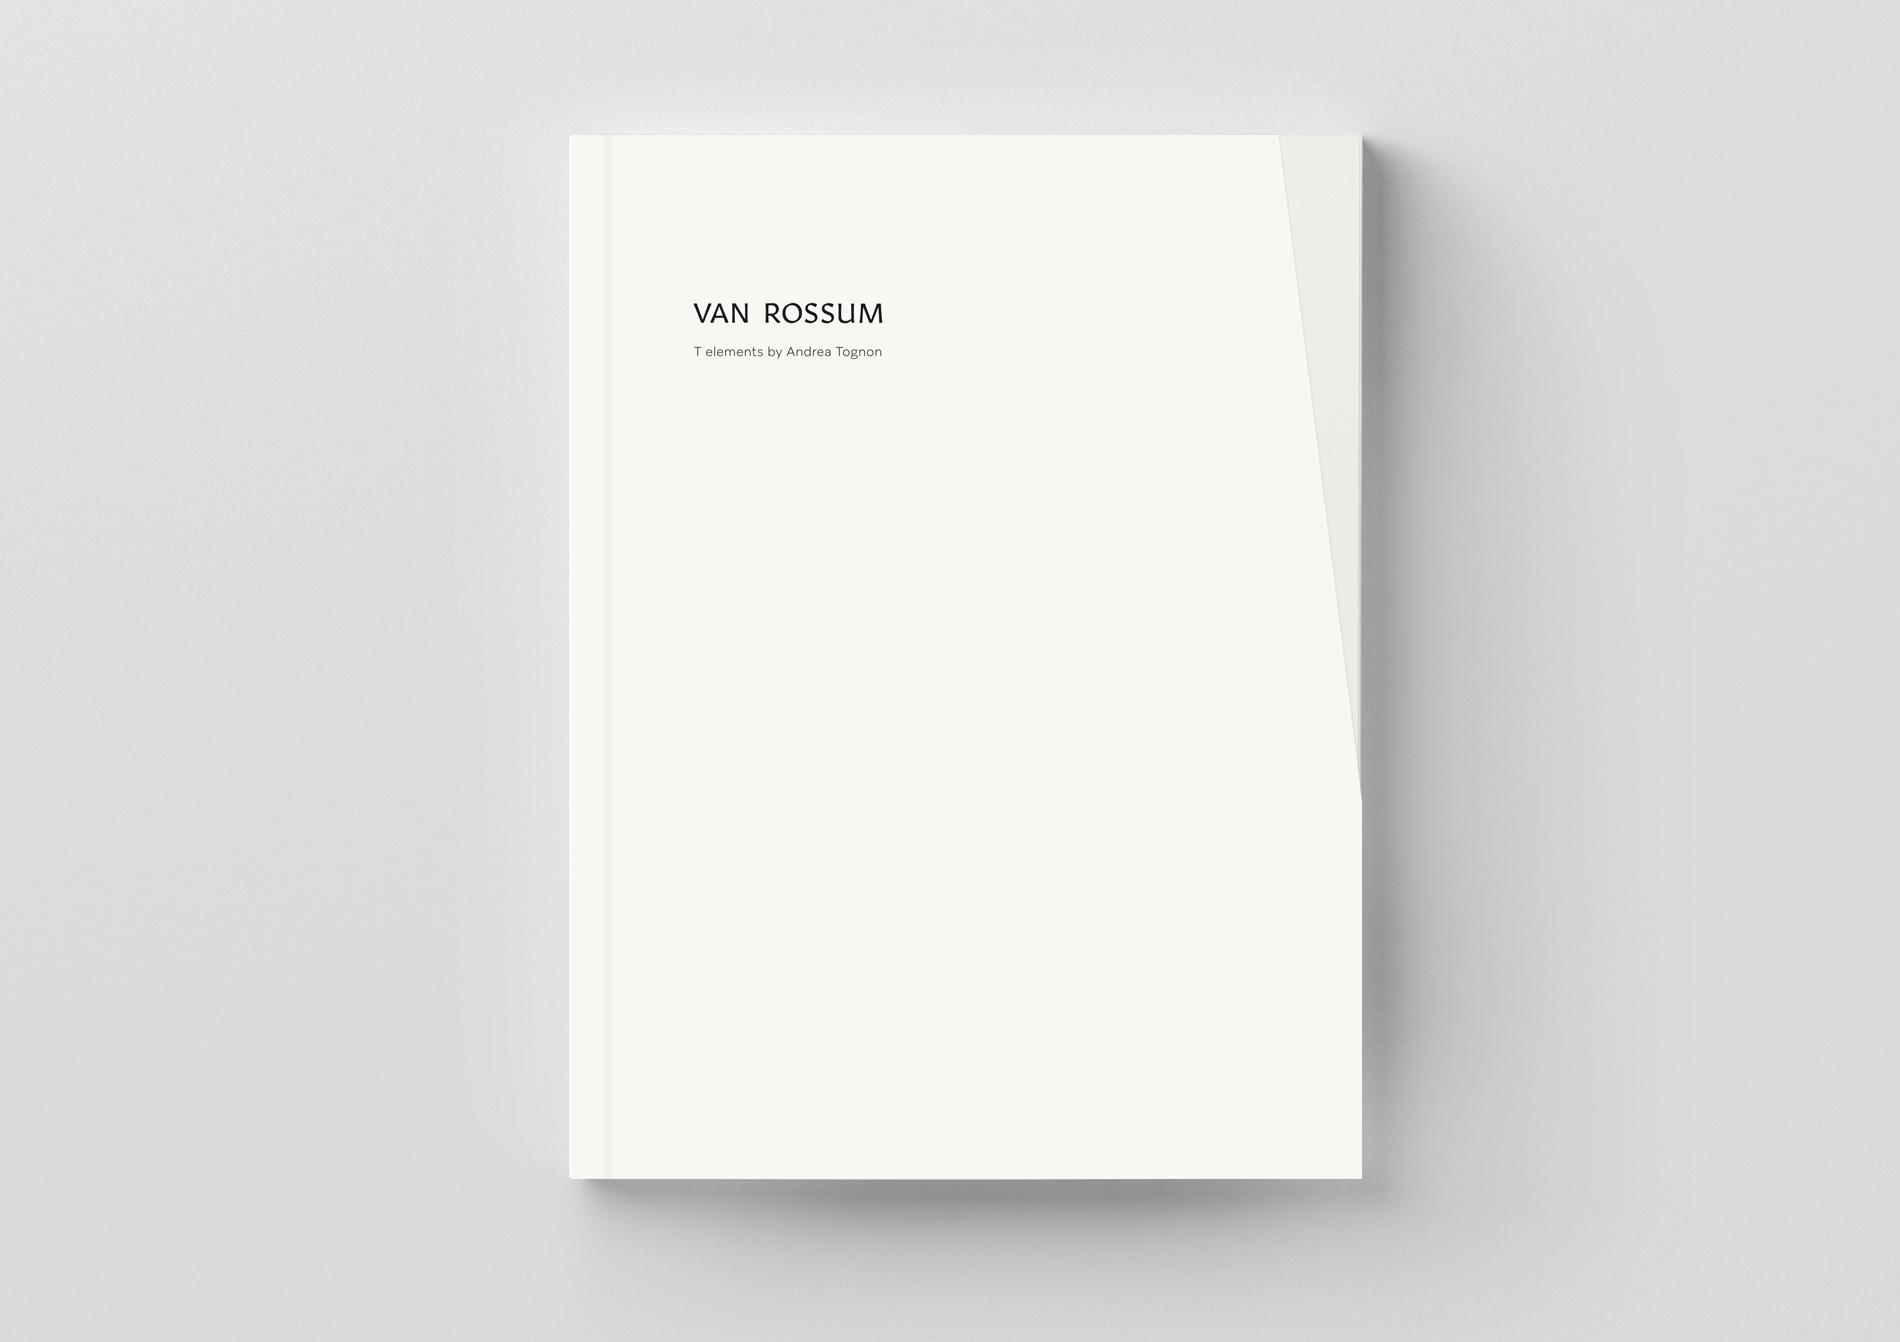 nicoletta-dalfino-van-rossum-andrea-tognon-lookbook-2018-cover-cut